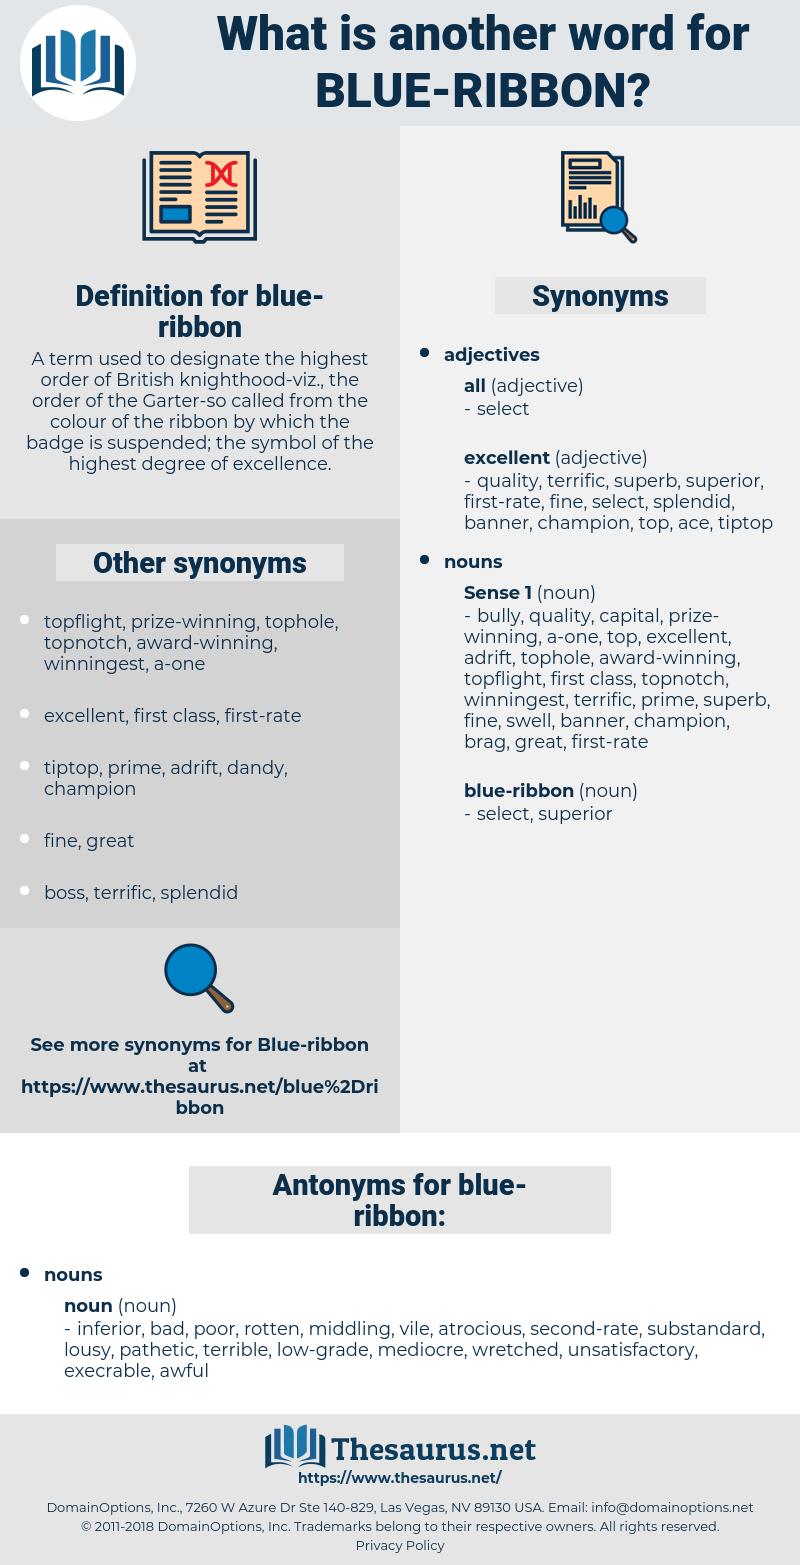 blue-ribbon, synonym blue-ribbon, another word for blue-ribbon, words like blue-ribbon, thesaurus blue-ribbon